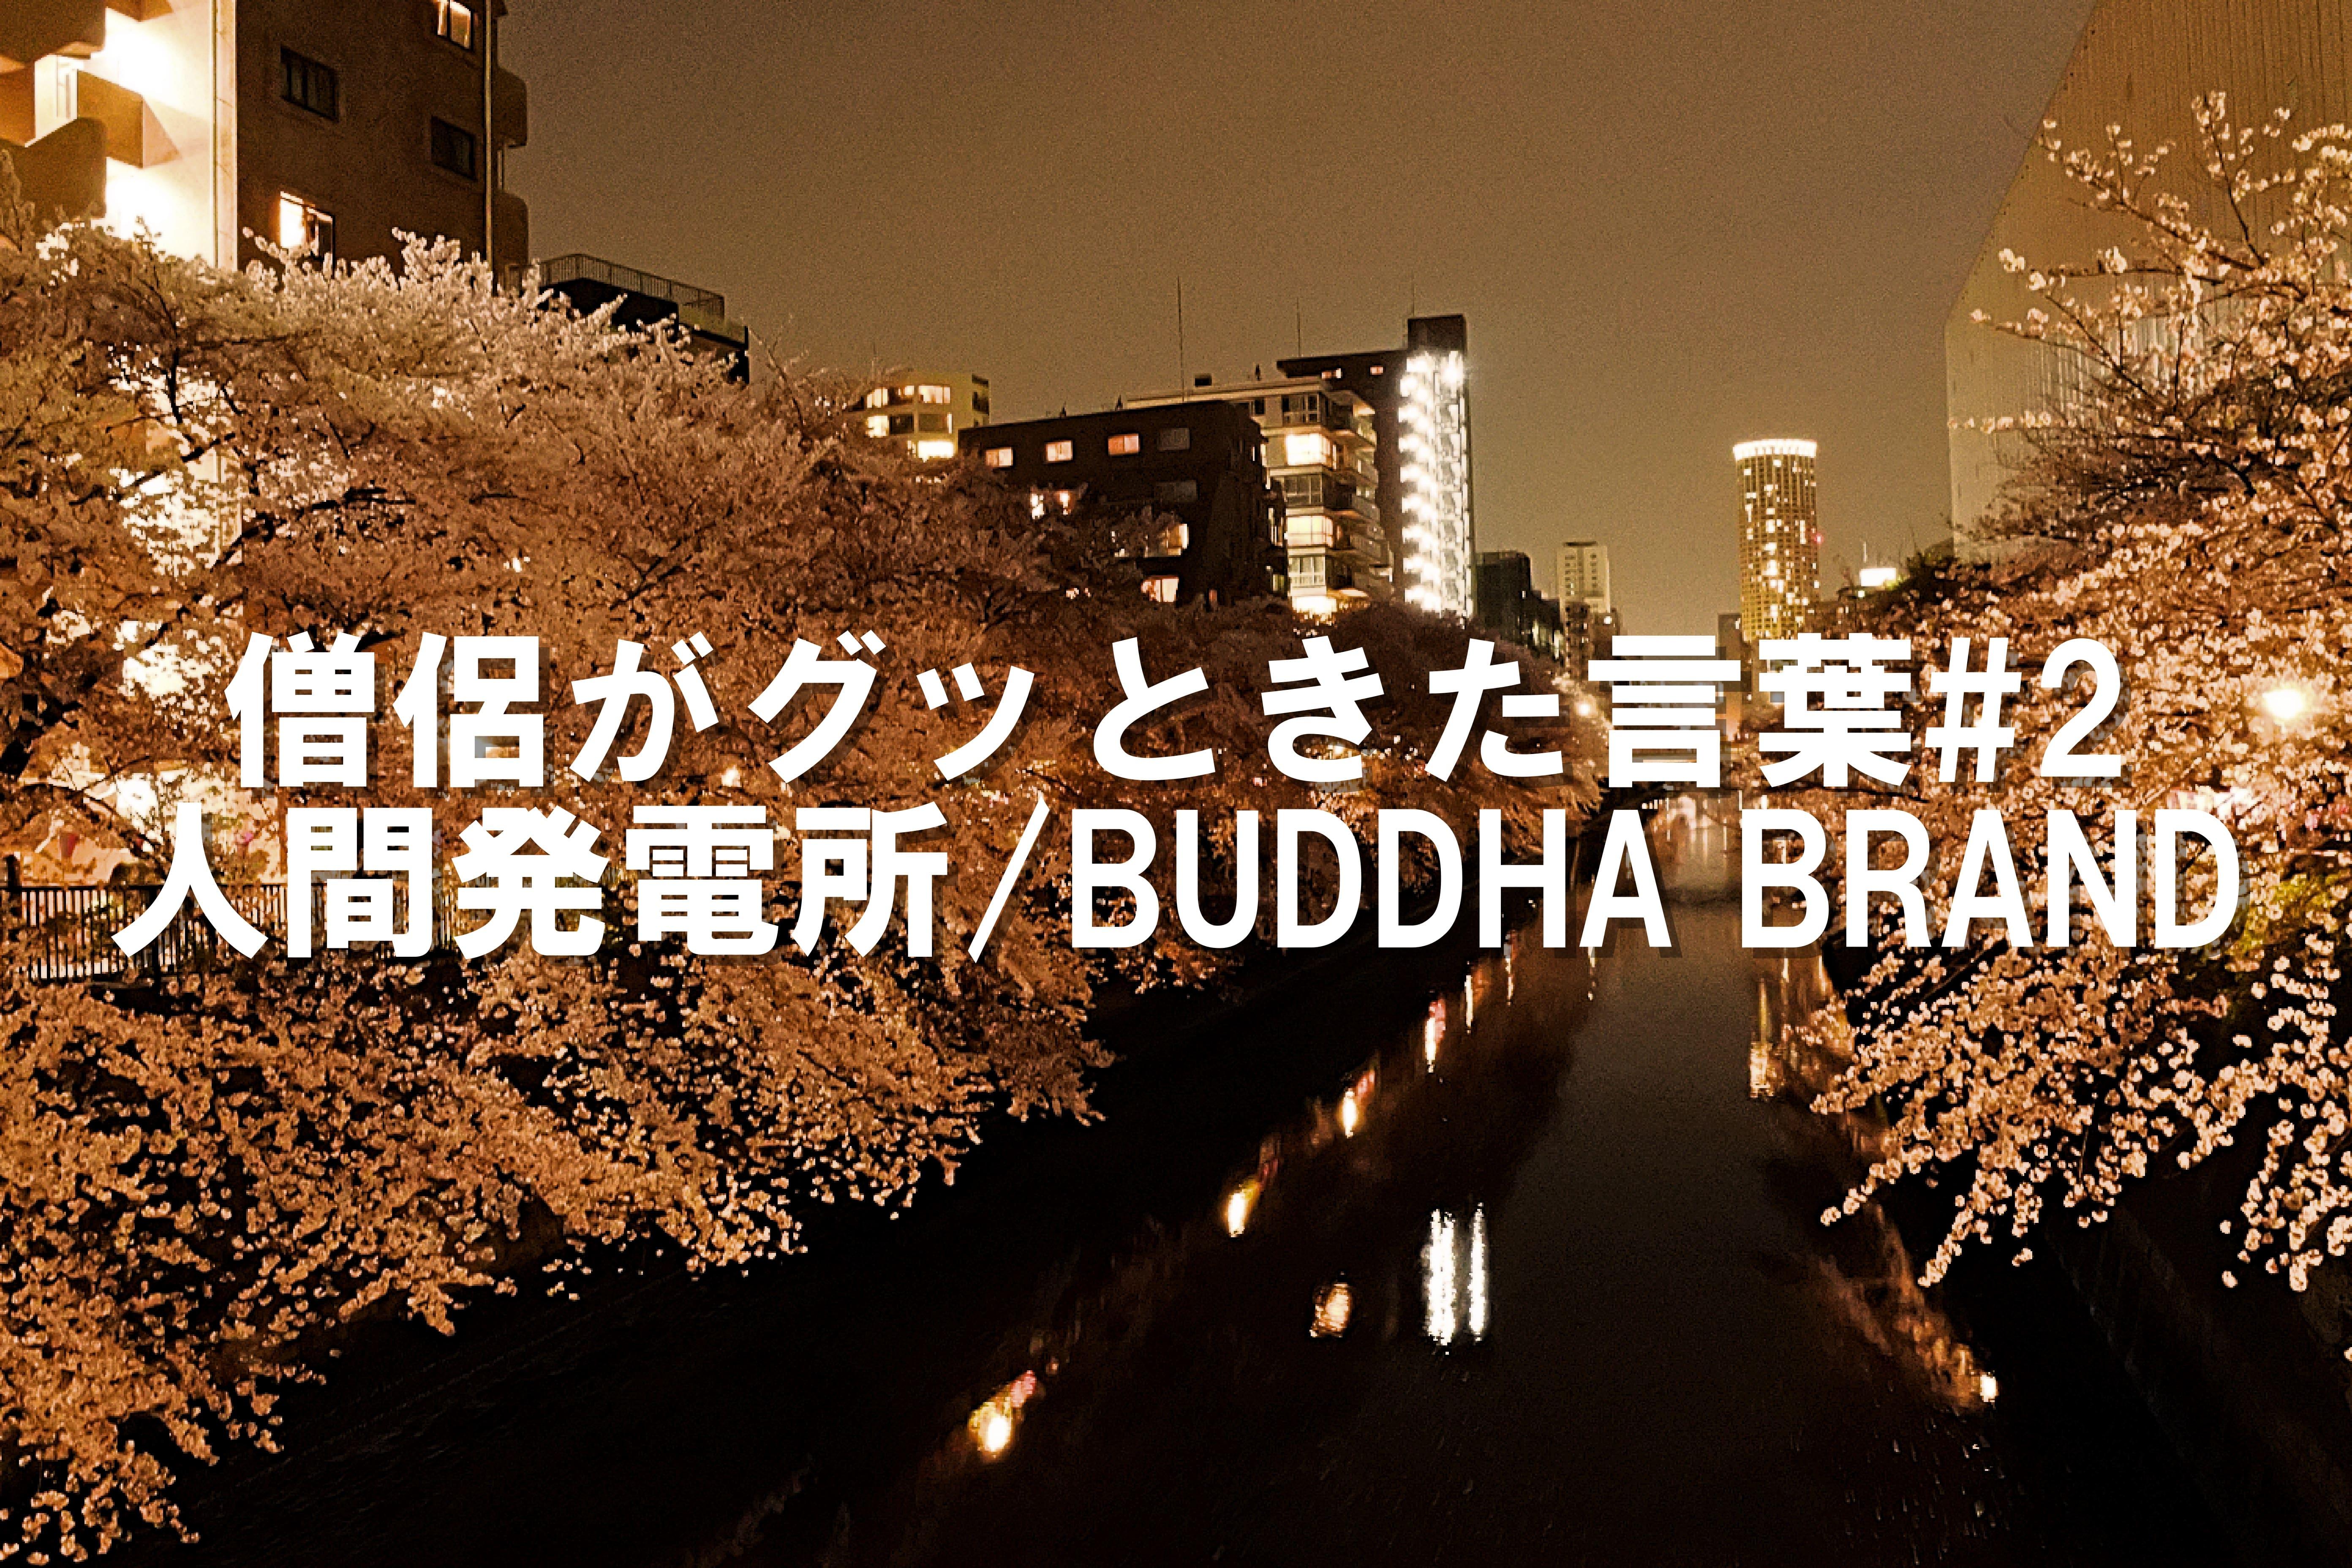 Brand 発電 所 人間 buddha